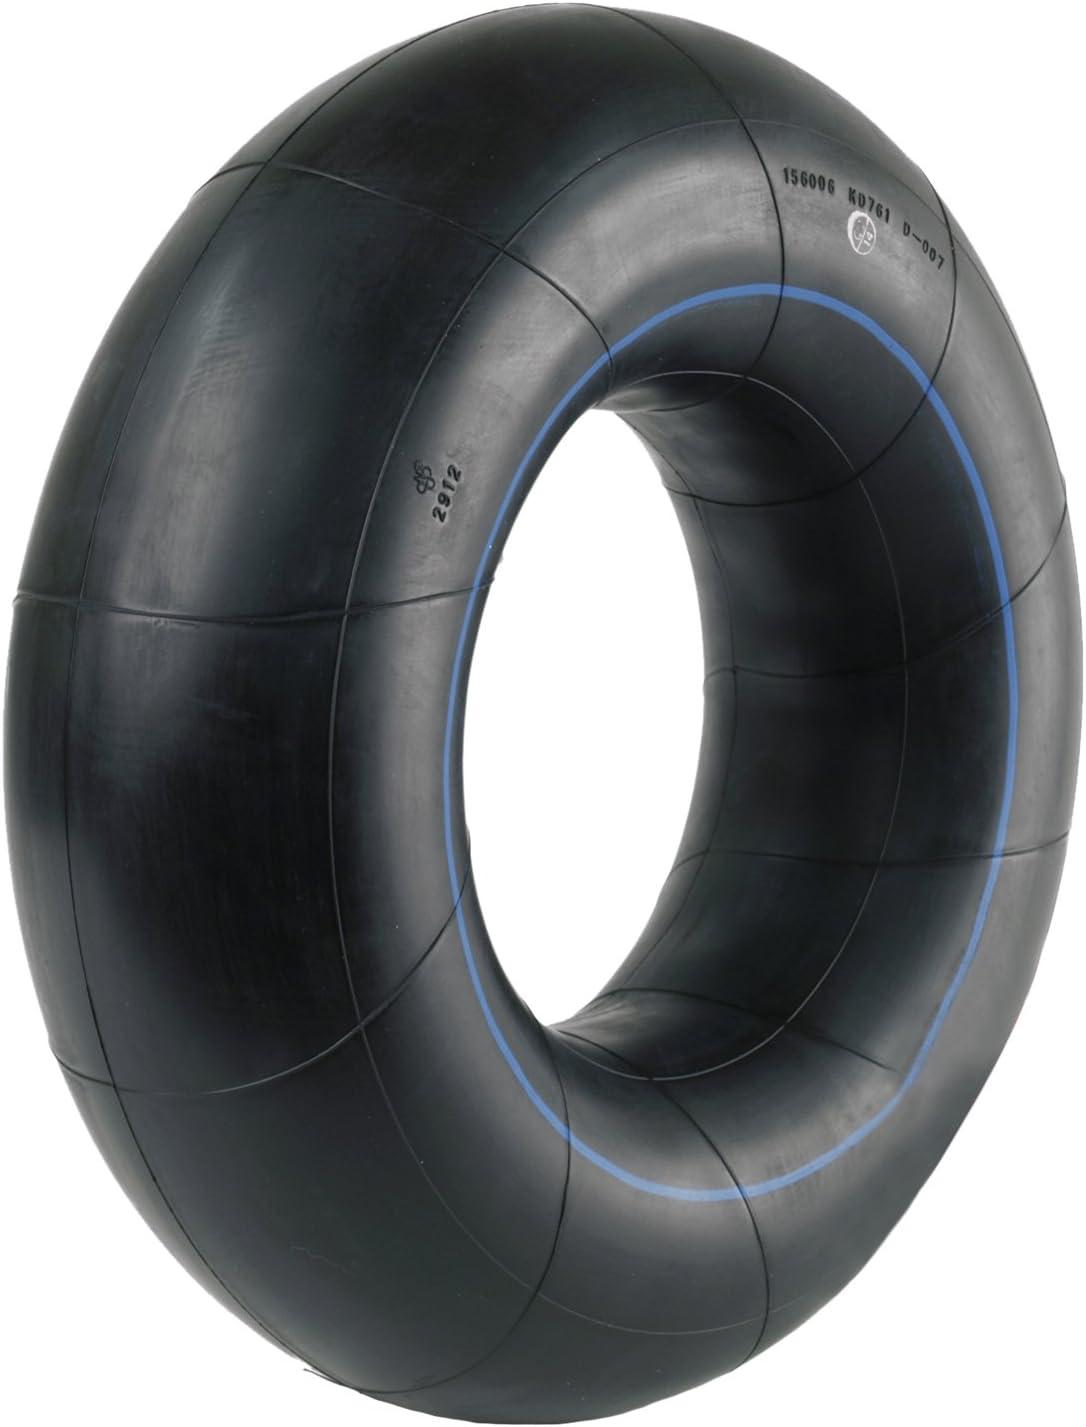 Martin Wheel T408K Lawn & Garden / Industrial Inner Tube, 480/400-8 TR13